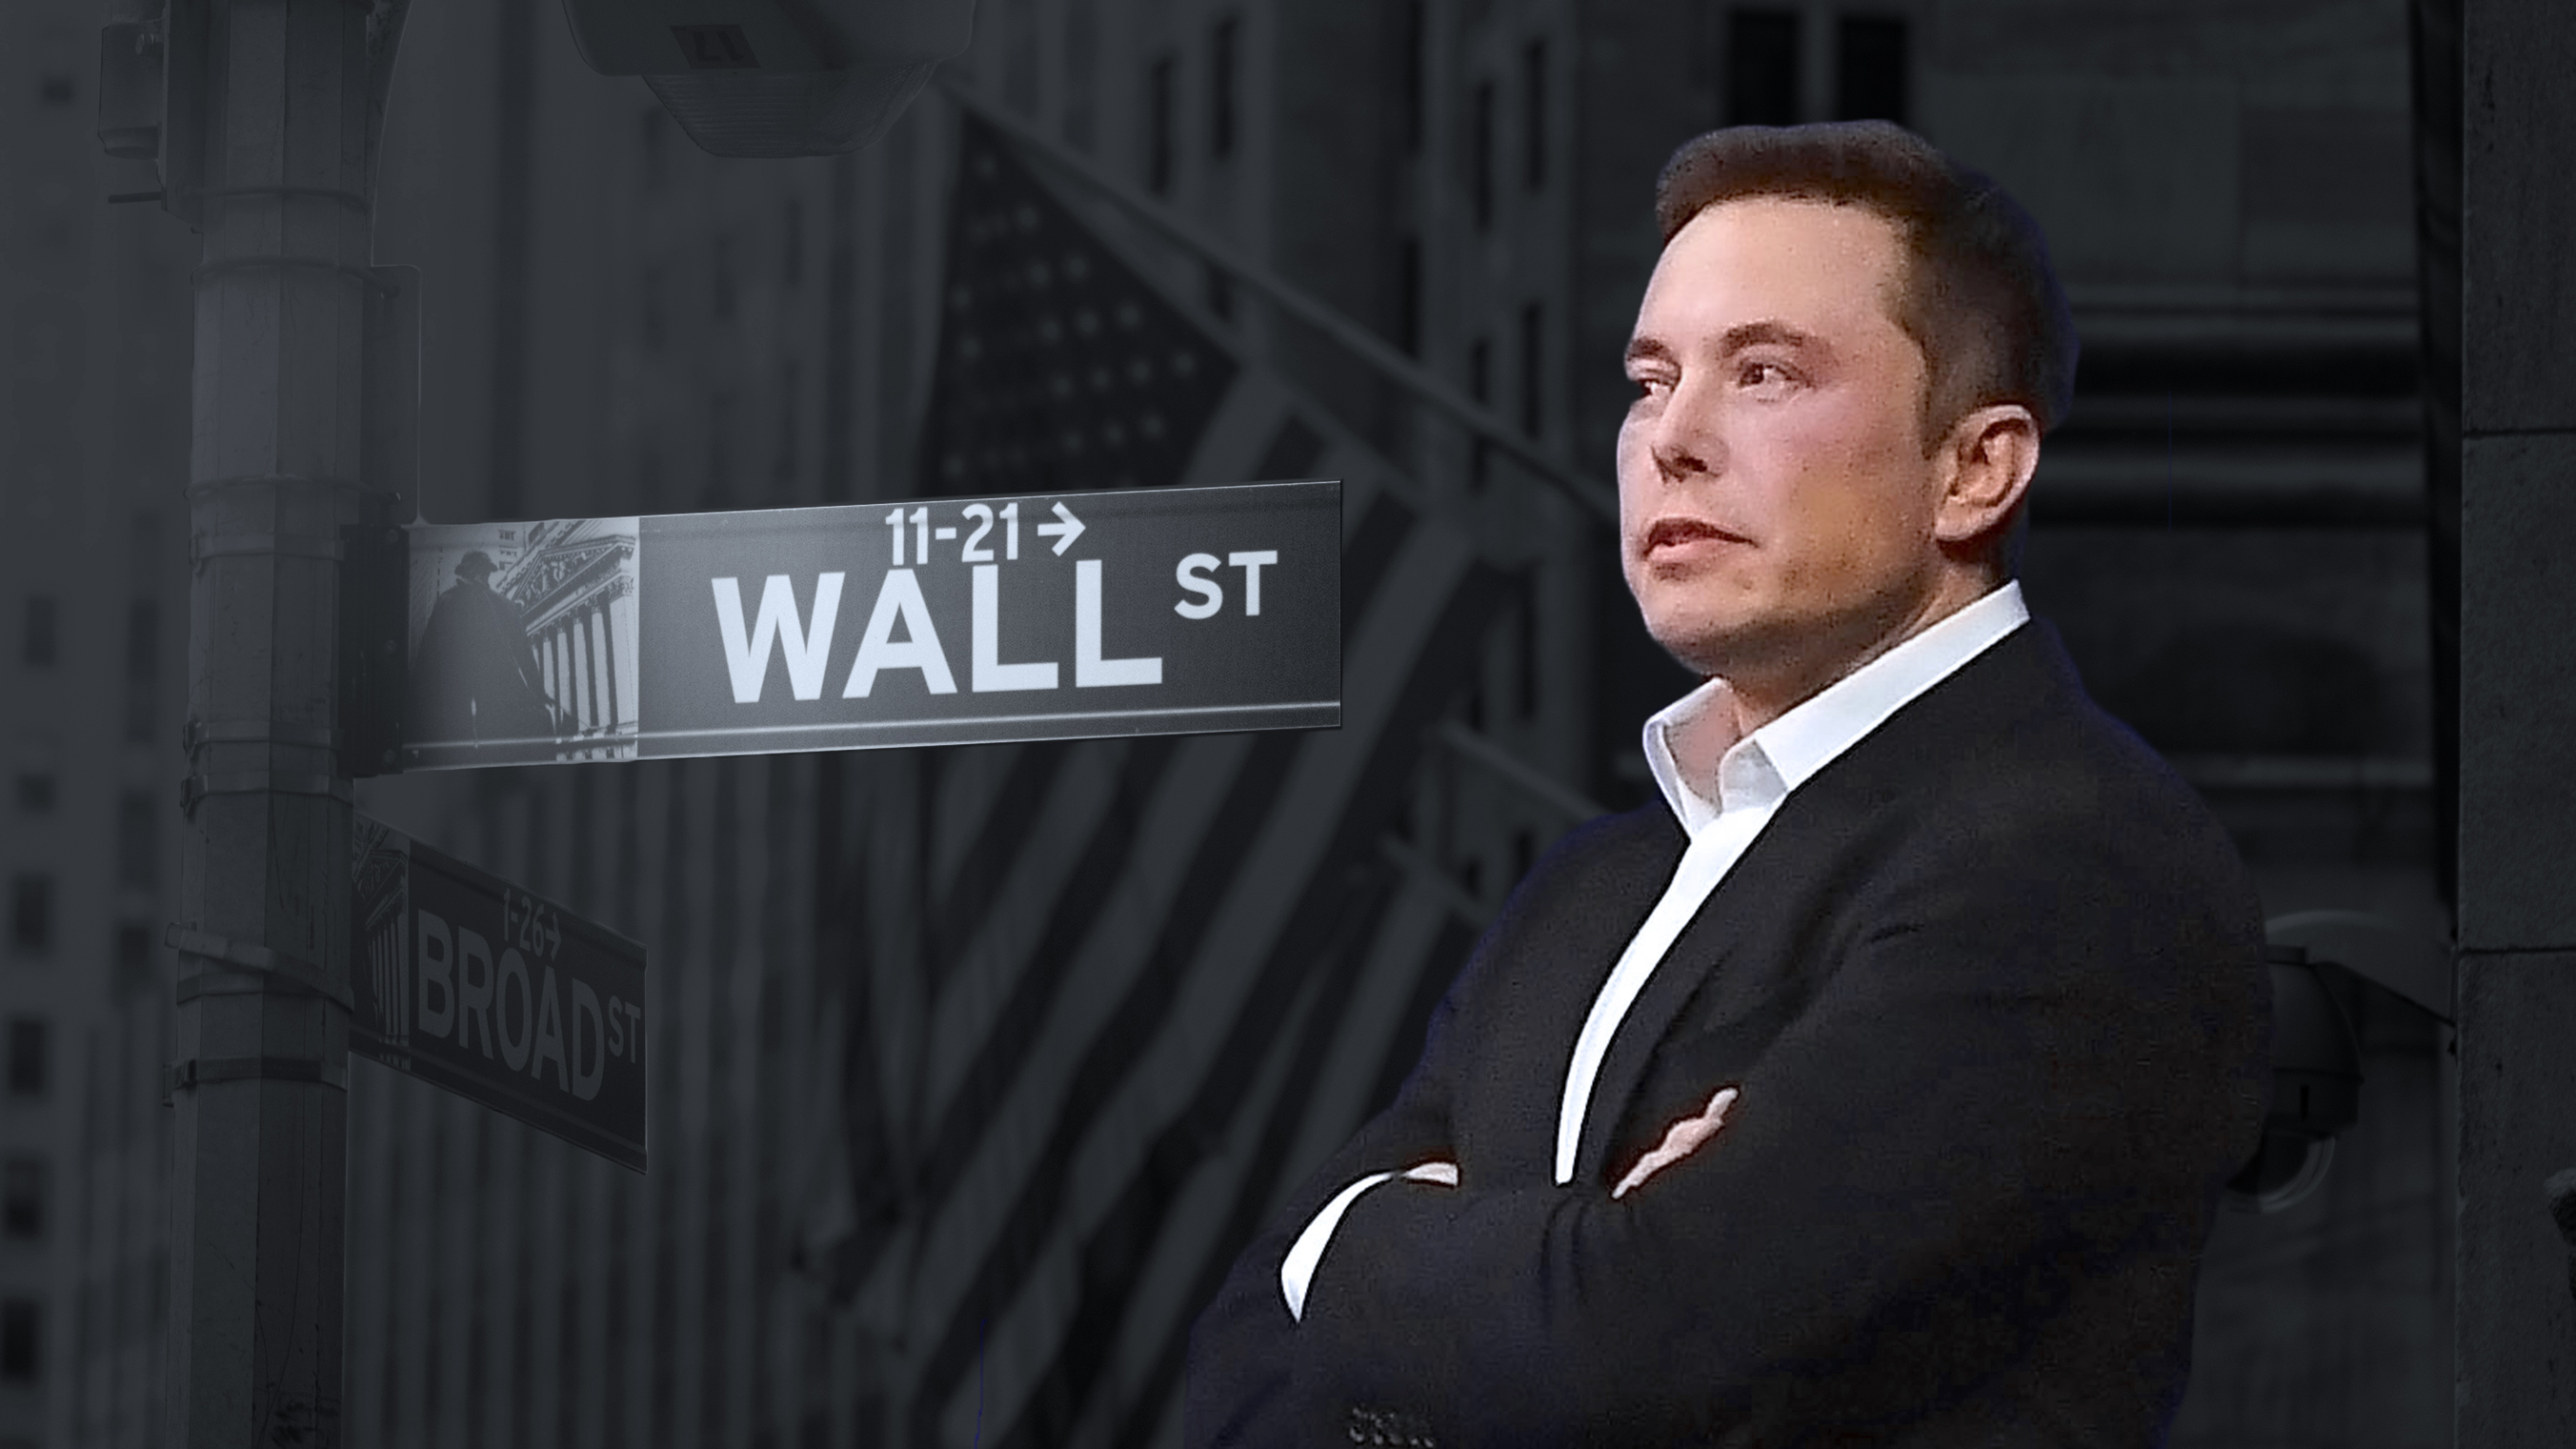 Elon Musk interview stirs controversy - CNN Video